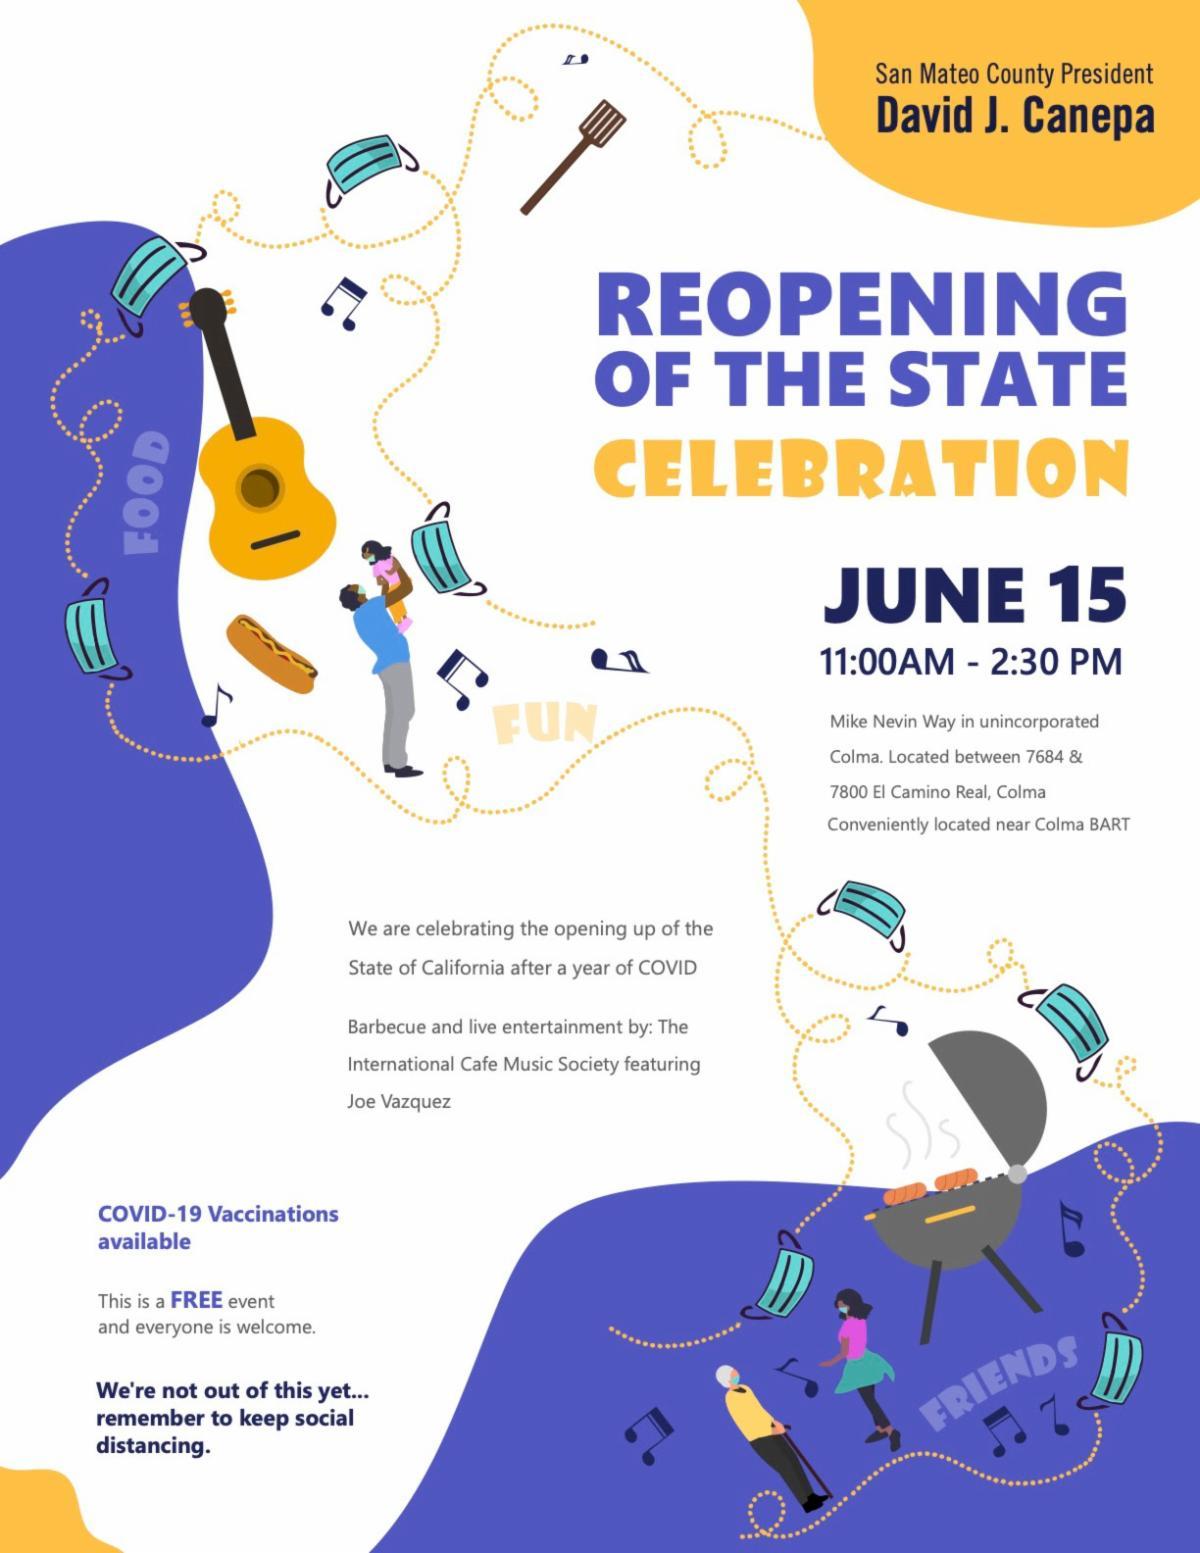 Opening June 15th Celebration